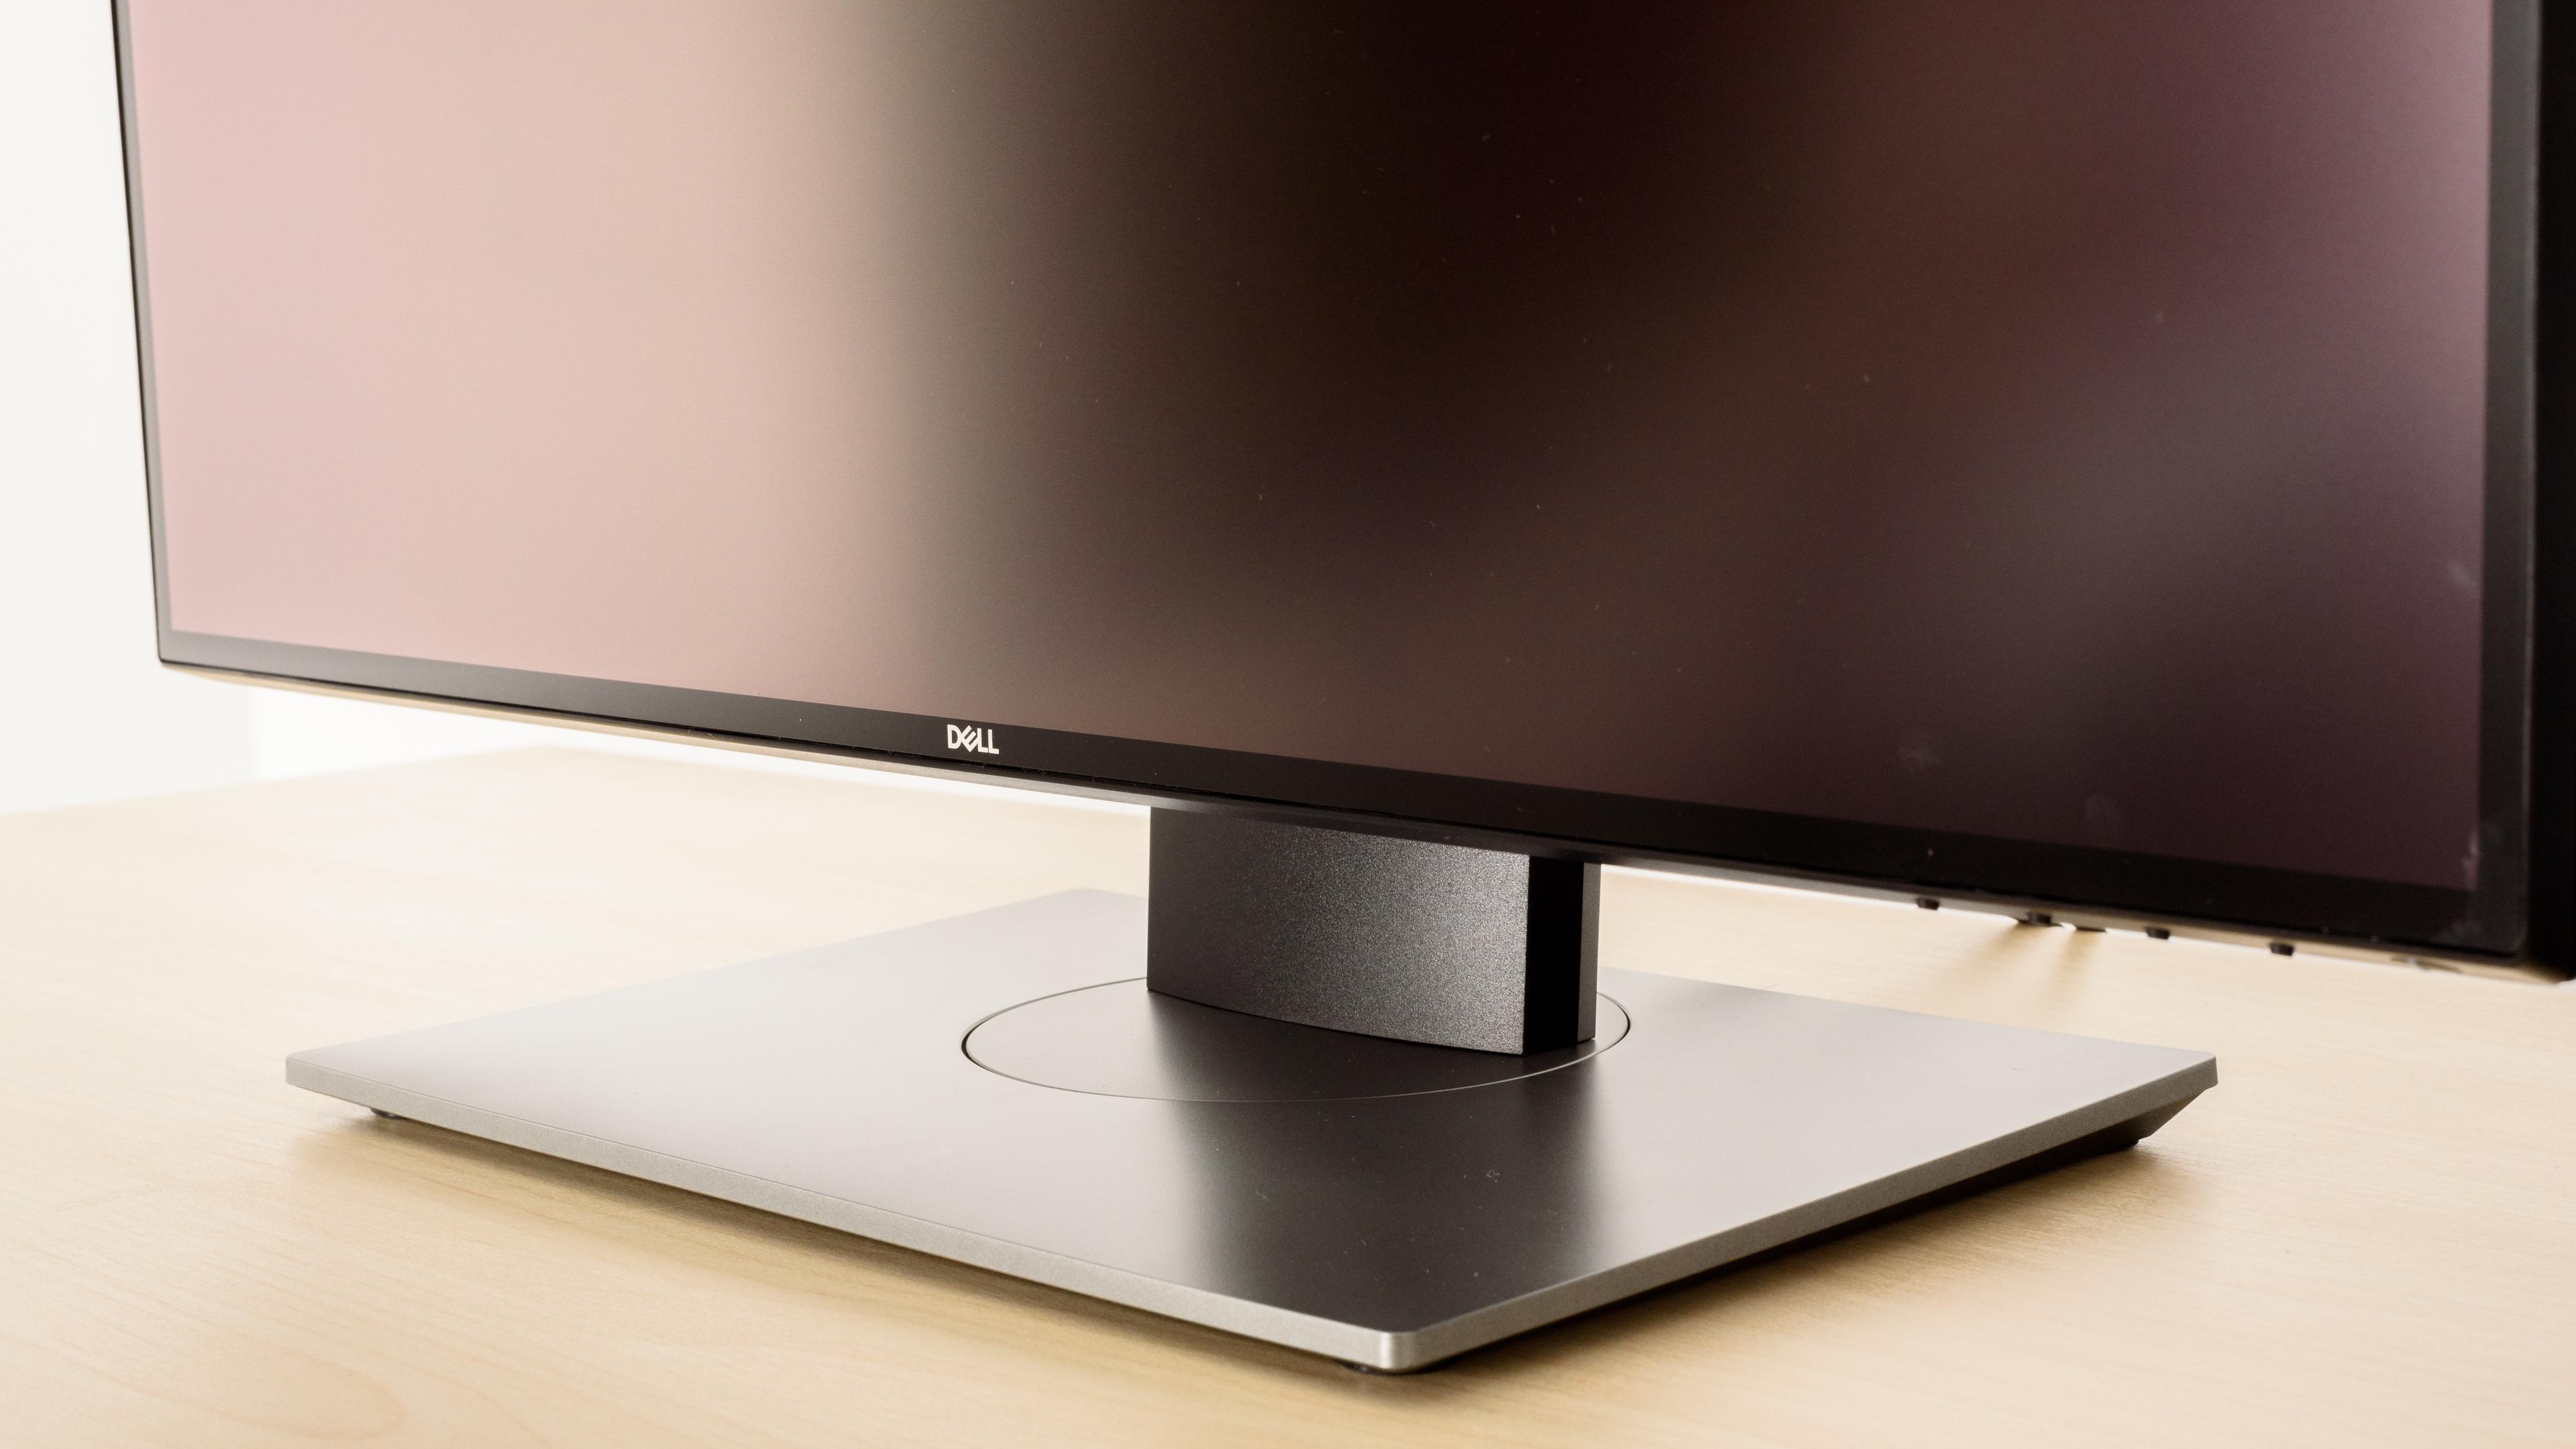 Dell U2518d Review Rtings Com